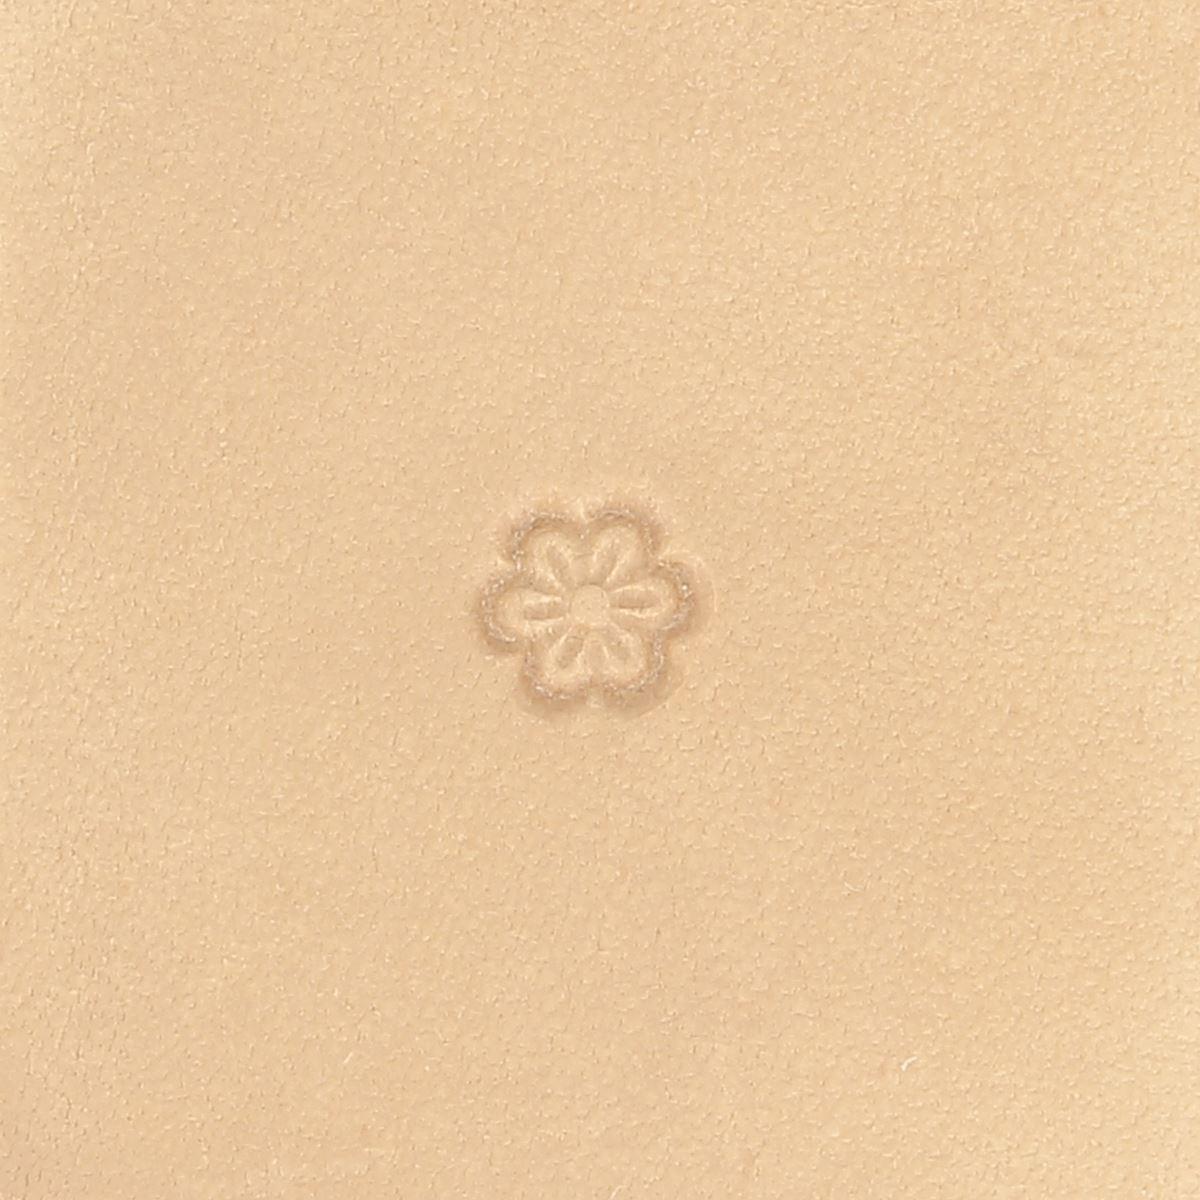 Matoir avec manche - Fleur - 6617